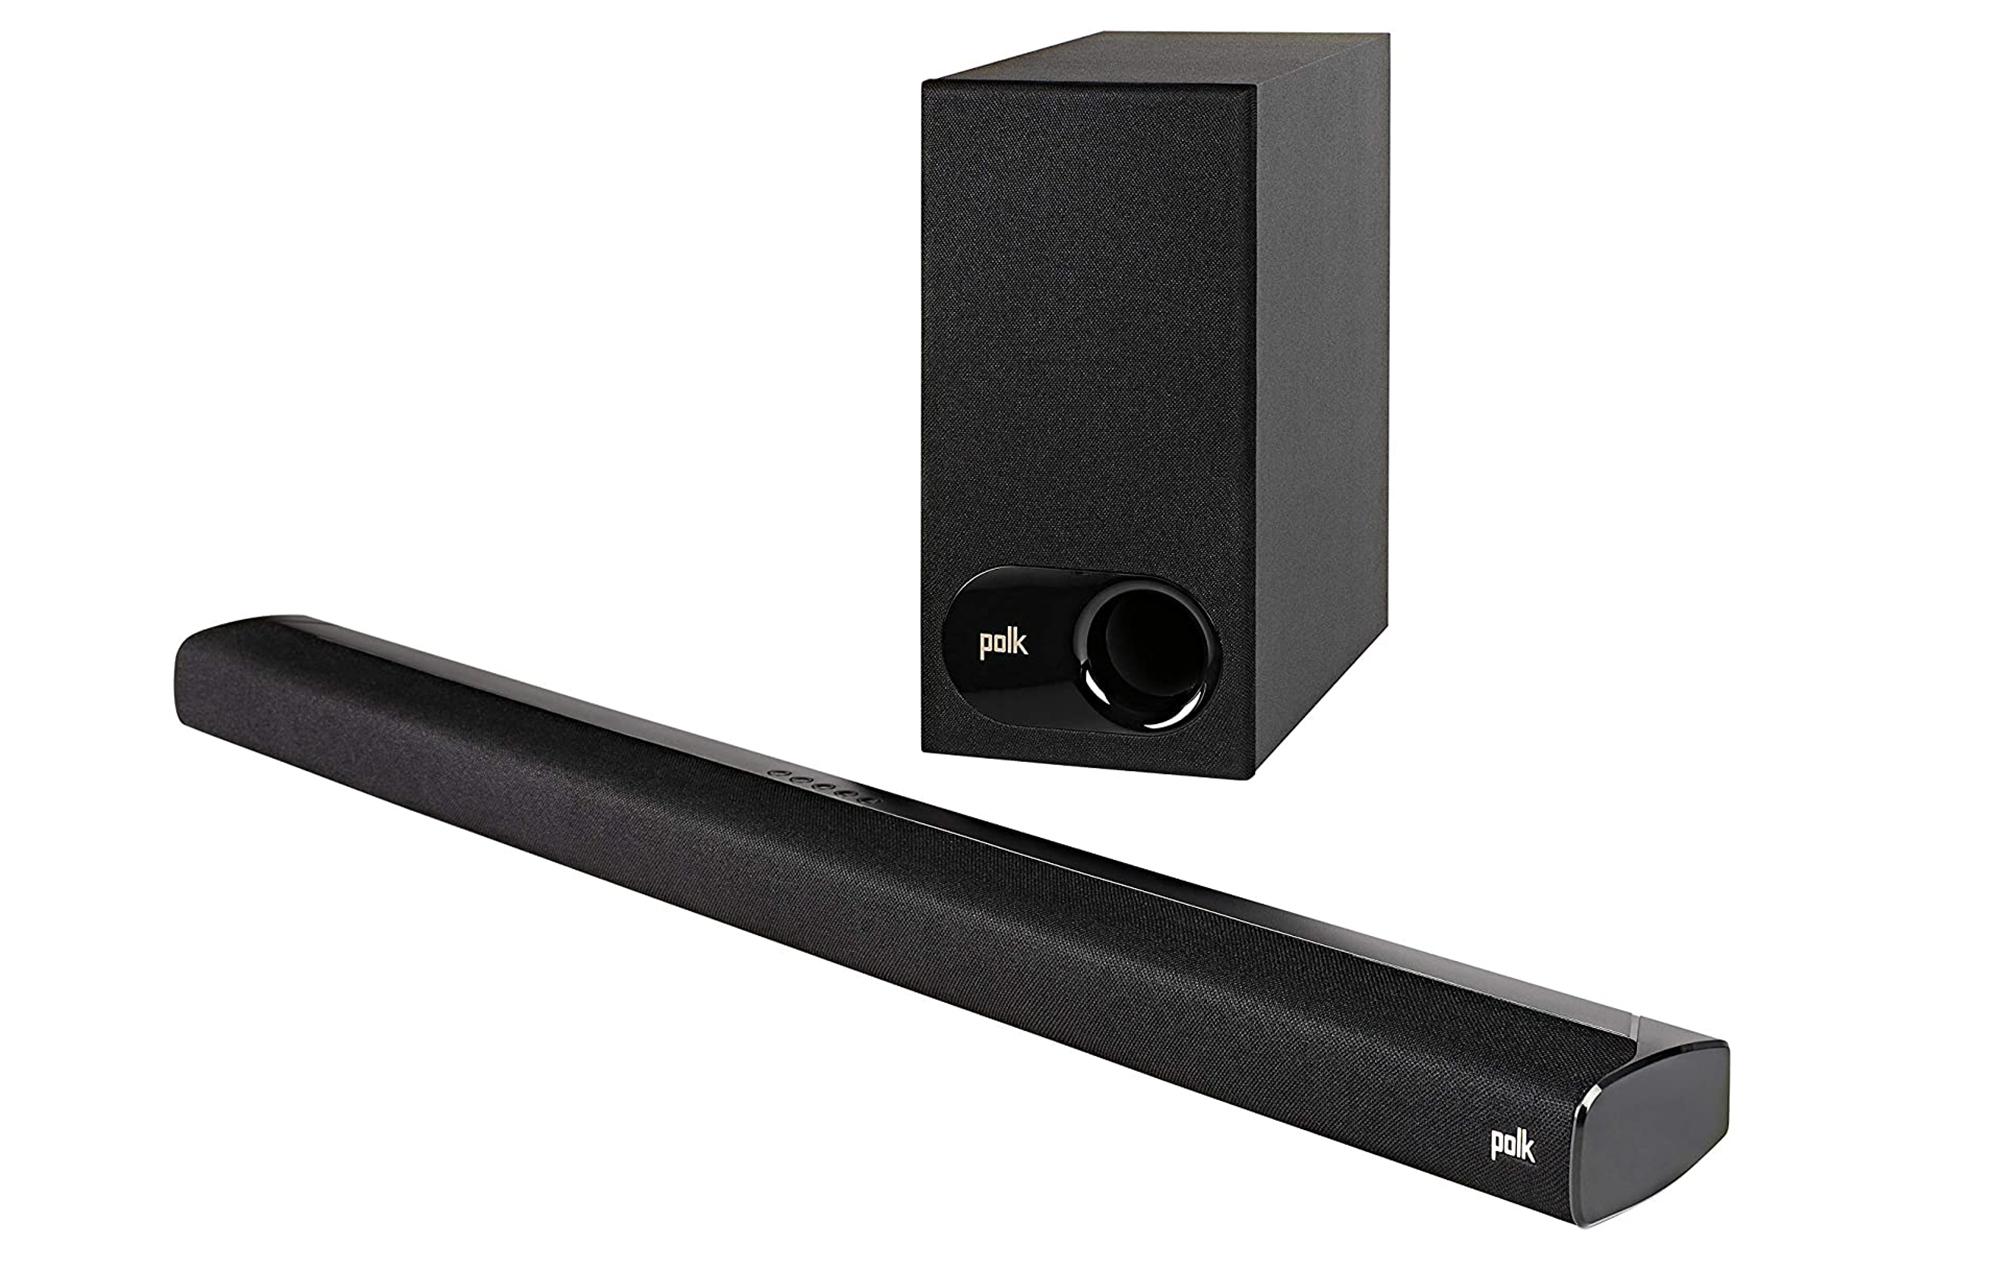 polk audio signa 2 soundbar